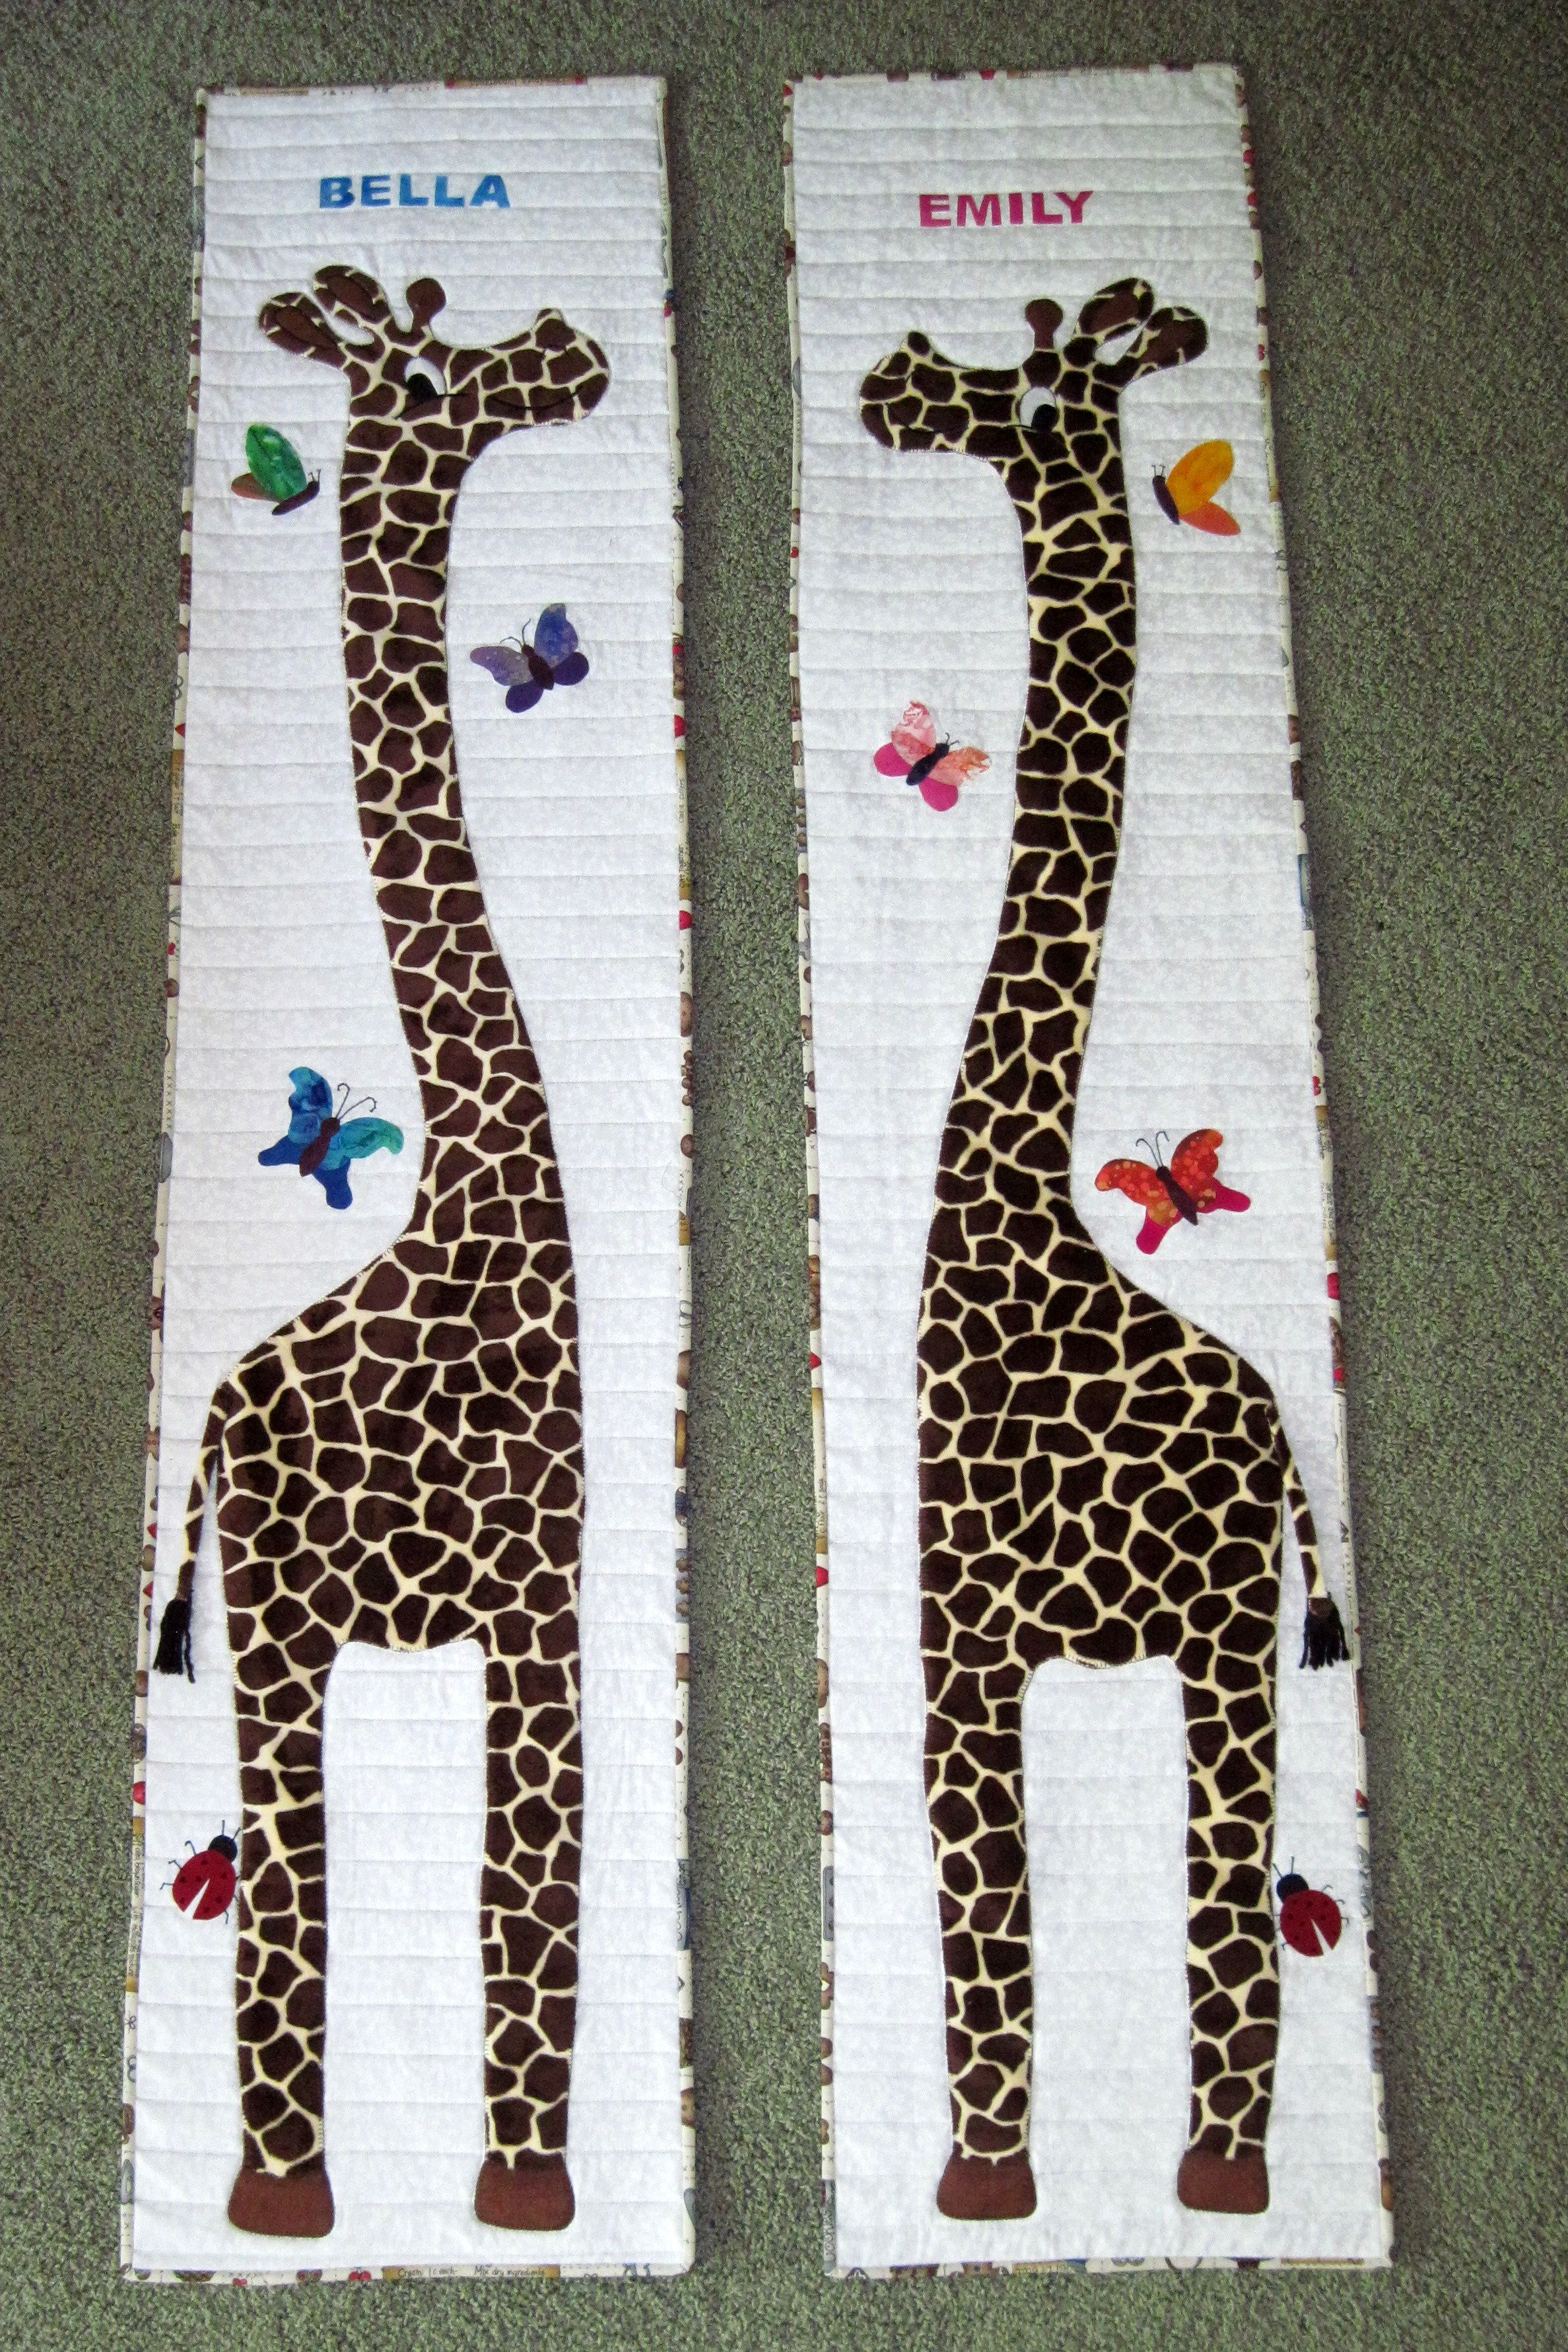 Giraffe growth charts i made for my twin granddaughters pattern giraffe growth charts i made for my twin granddaughters pattern by chi chi quilt designs nvjuhfo Choice Image